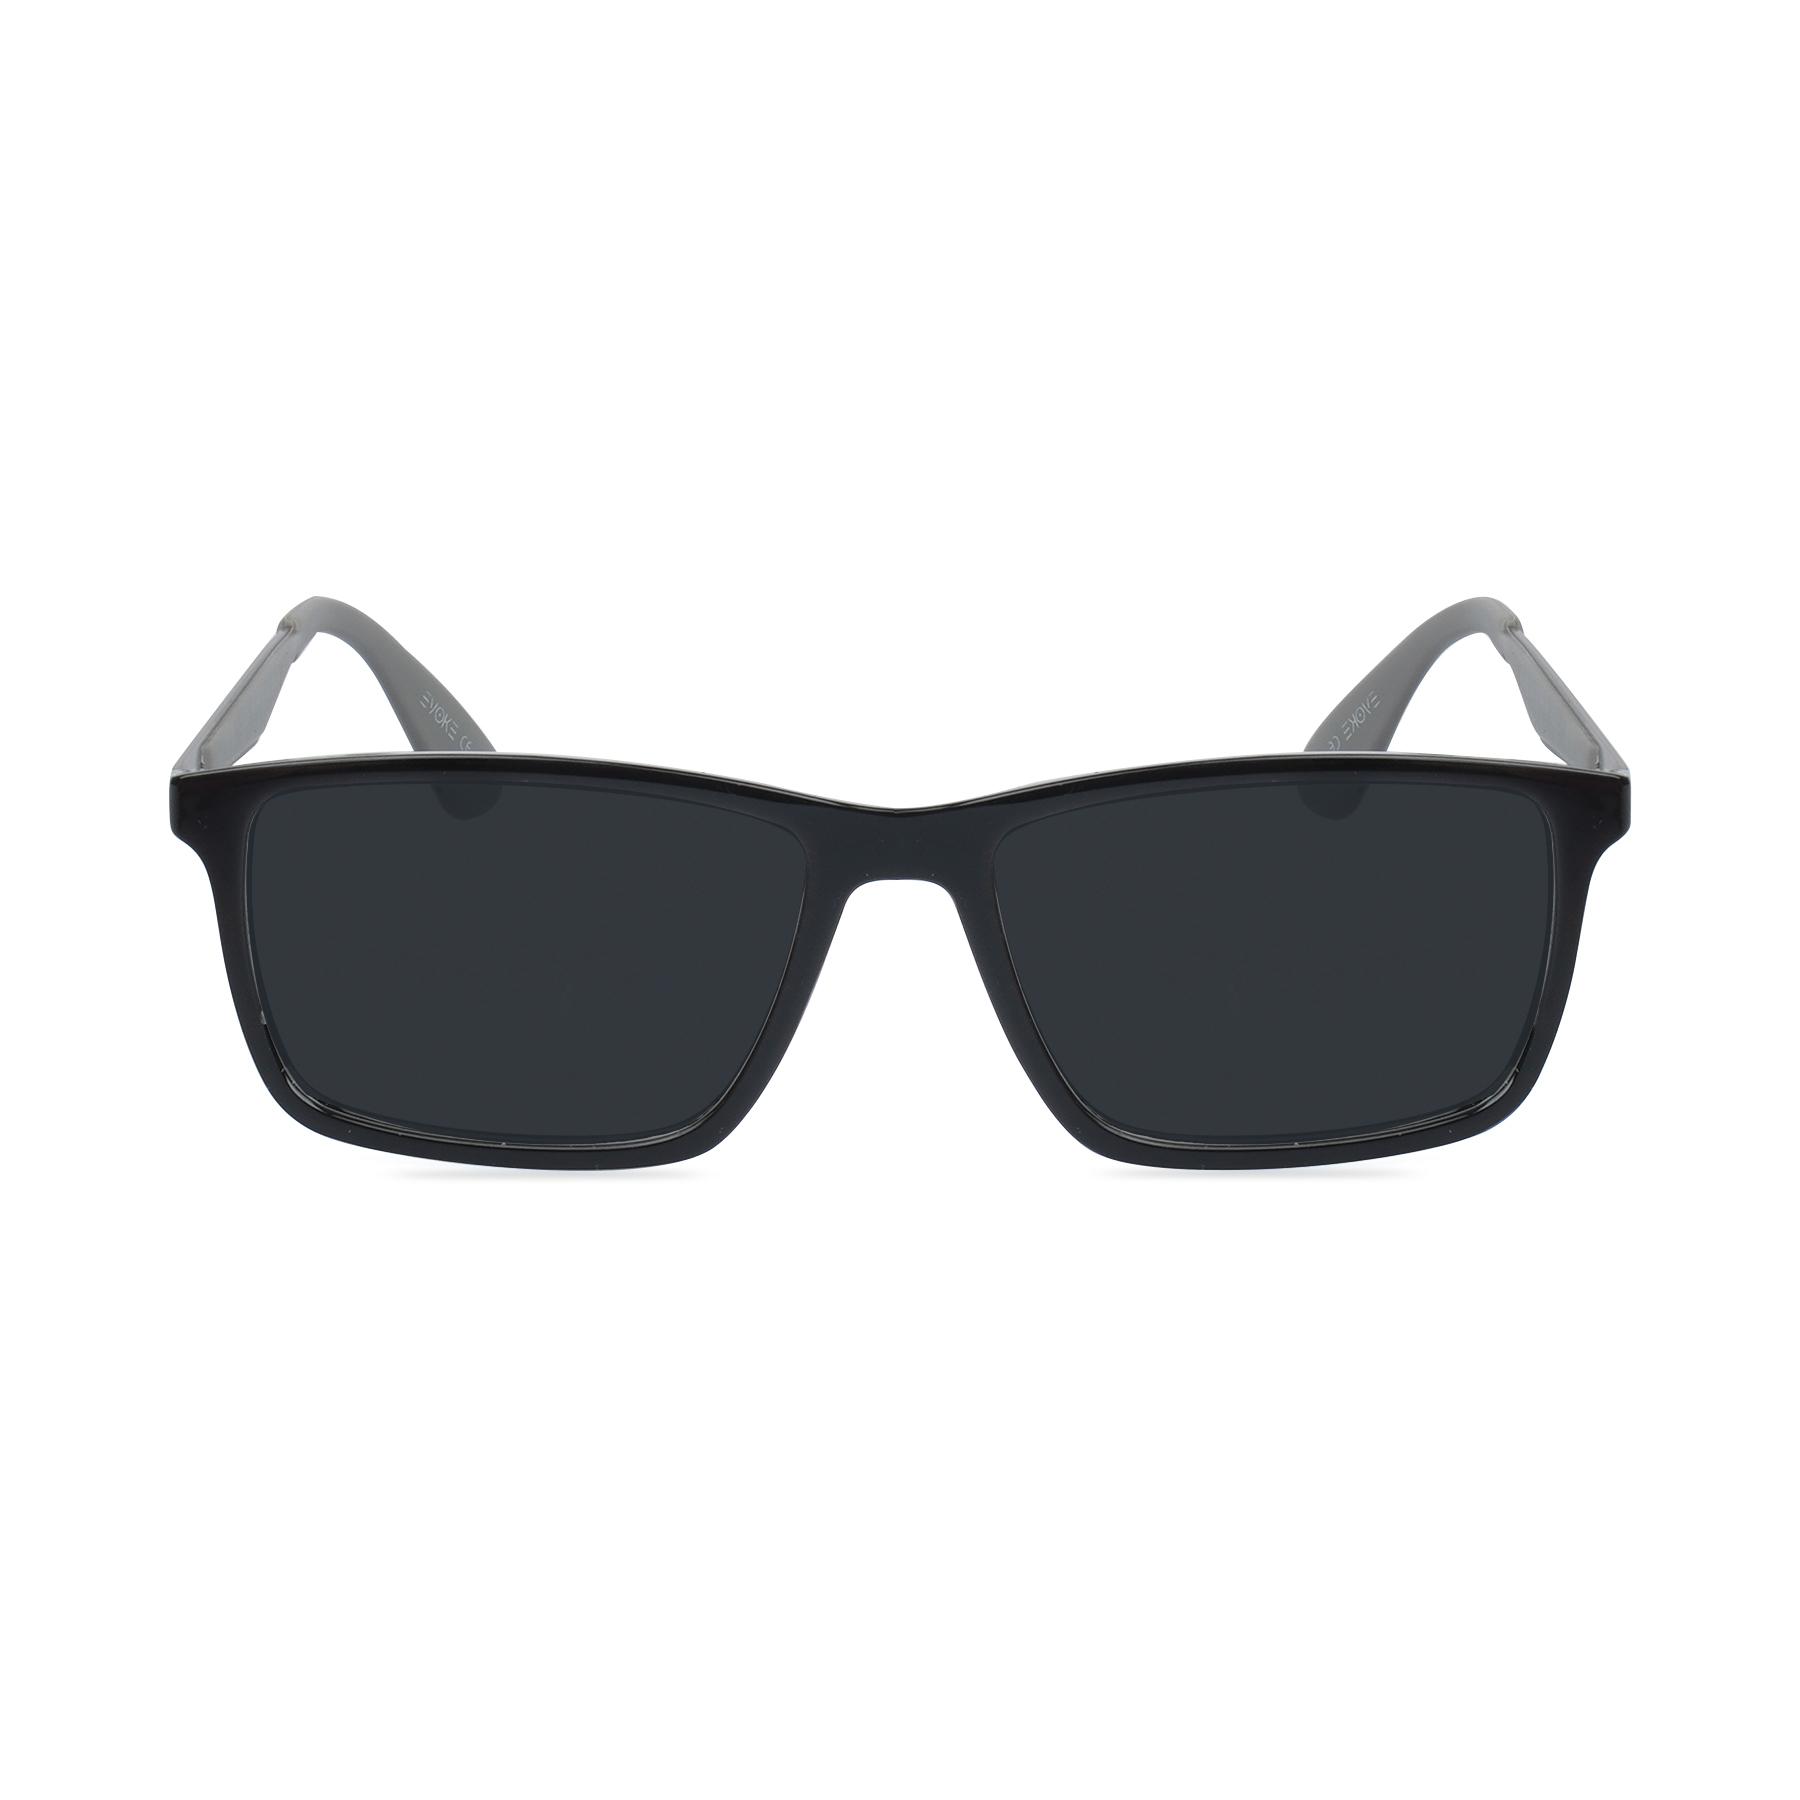 Evoke Miami Sunglasses